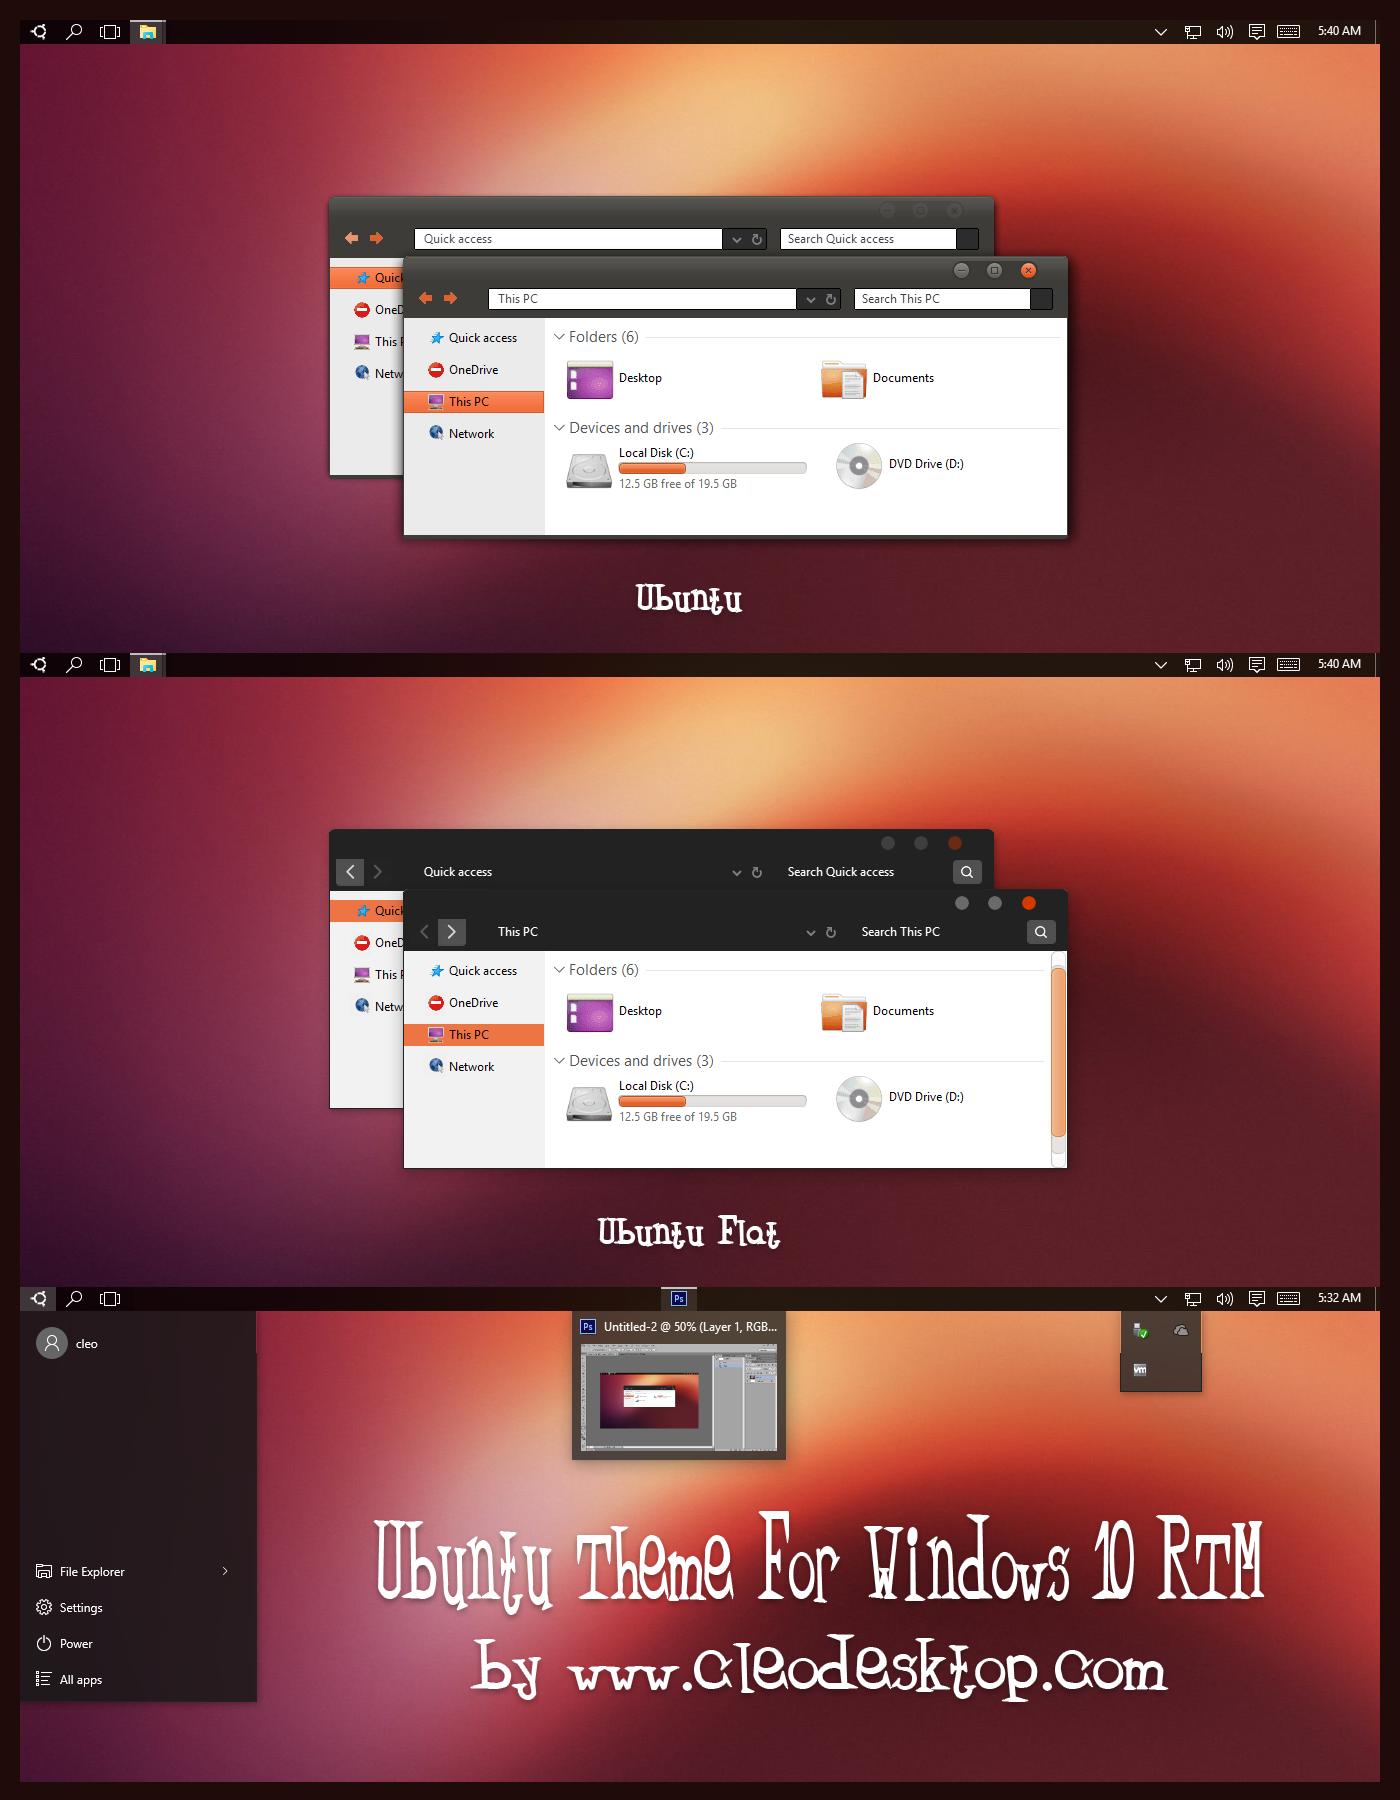 Ubuntu Theme For Windows 10 RTM